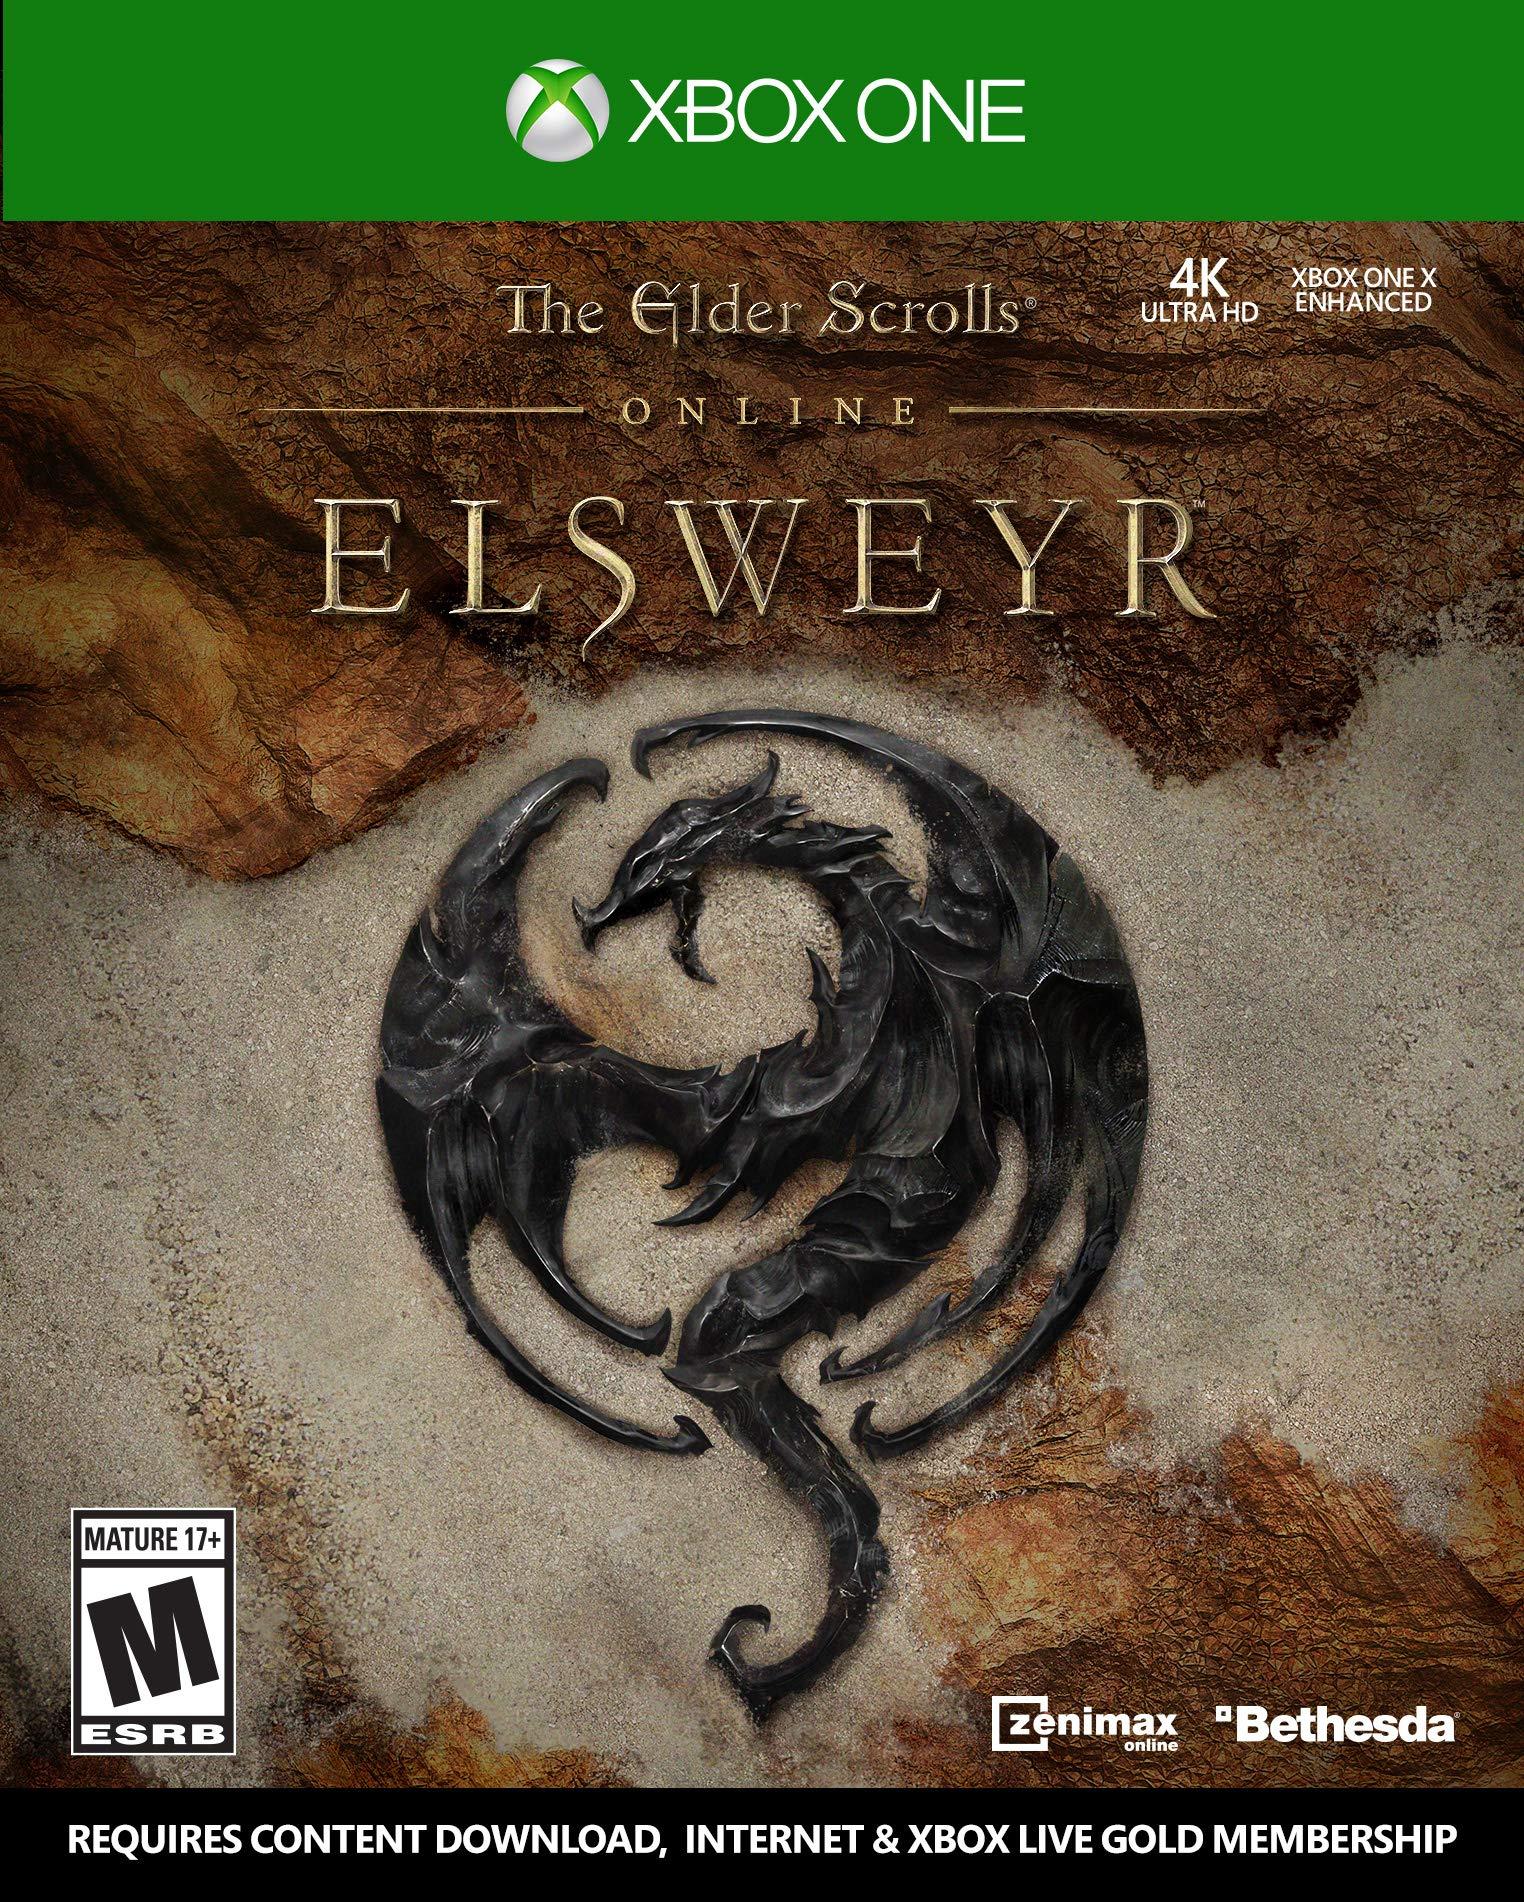 The Elder Scrolls Online: Elsweyr - Xbox One Standard Edition